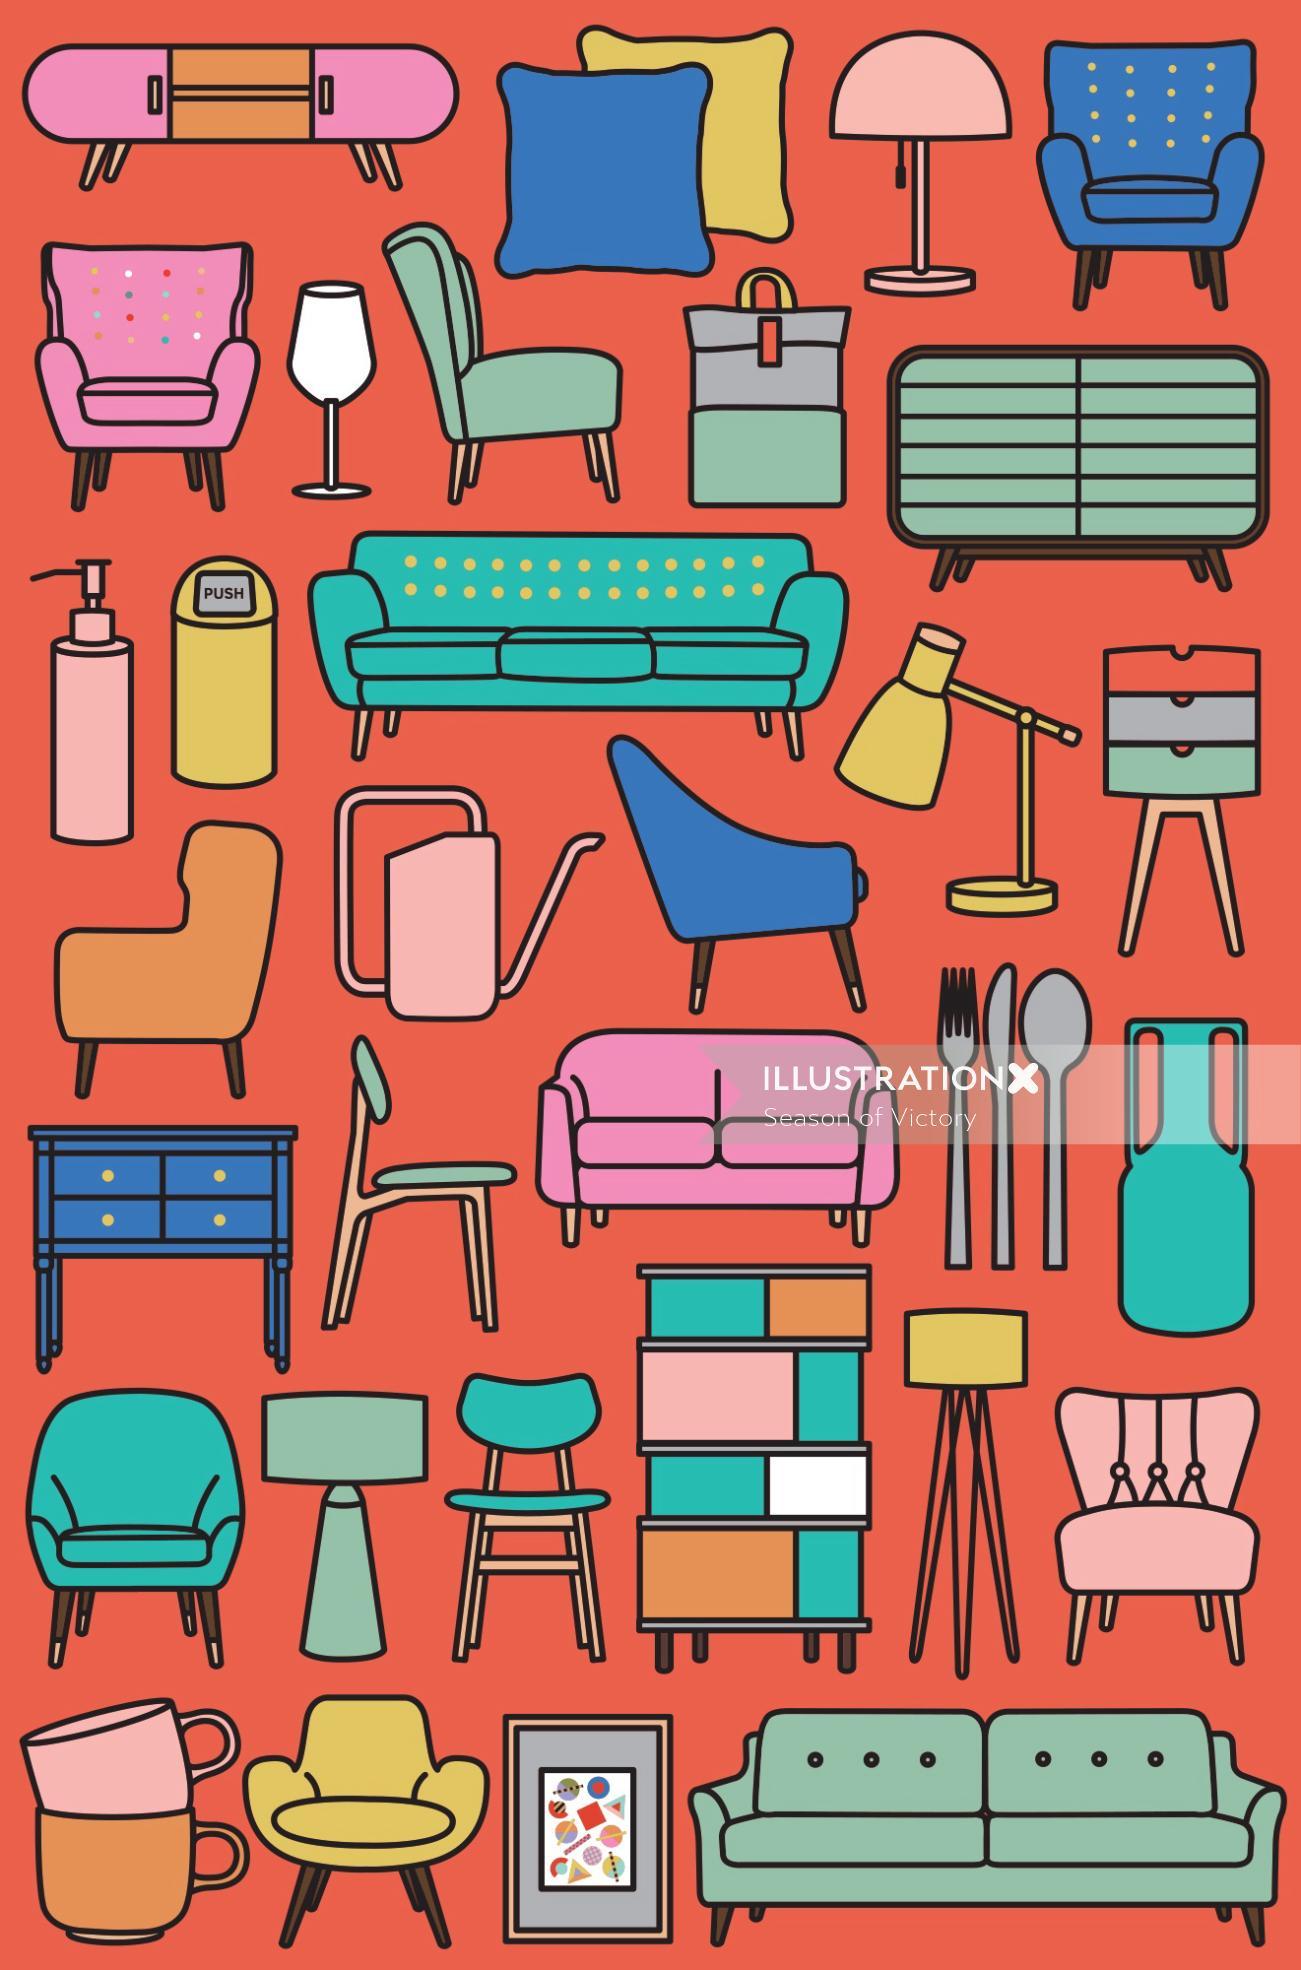 homeware, modern, pattern, furniture, print, poster, interior, homeware, chair, home, house, table,